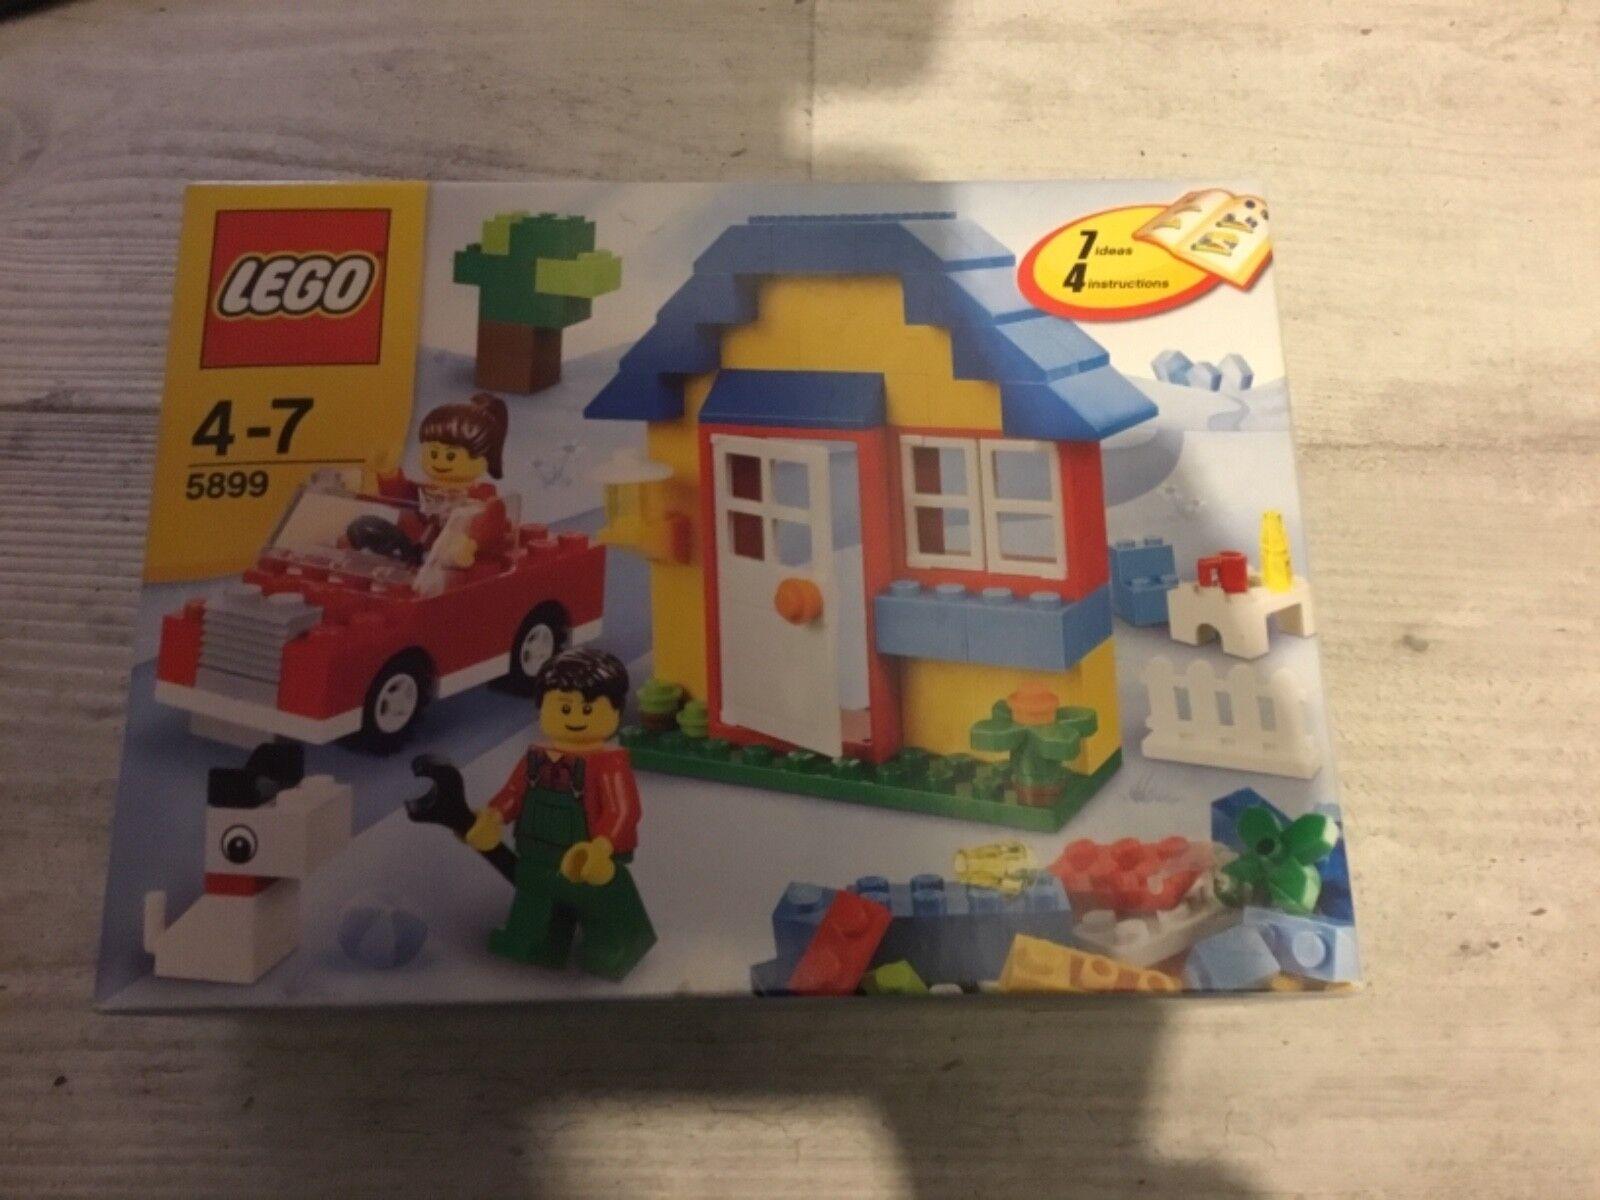 LEGO - 5899 Jeu de Construction Bricks & More Maisons NEUF et SCELLÉ